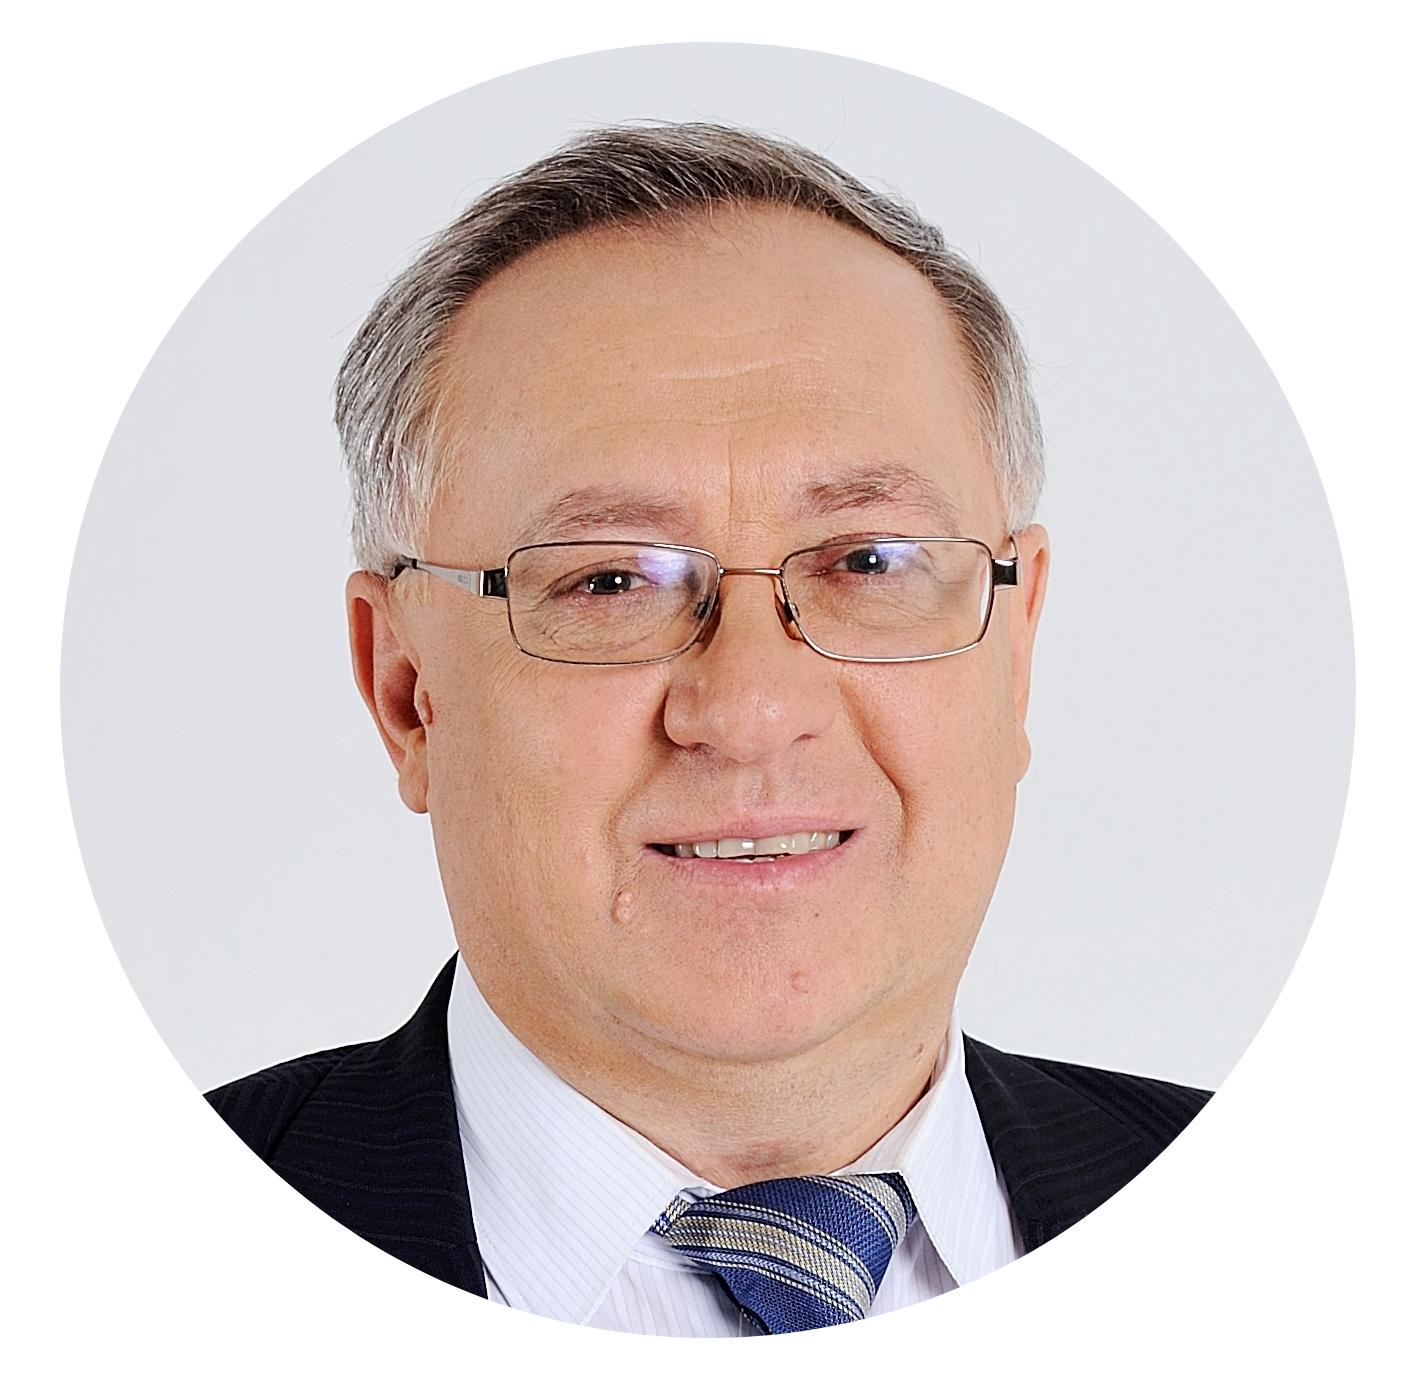 Павел Пахомов